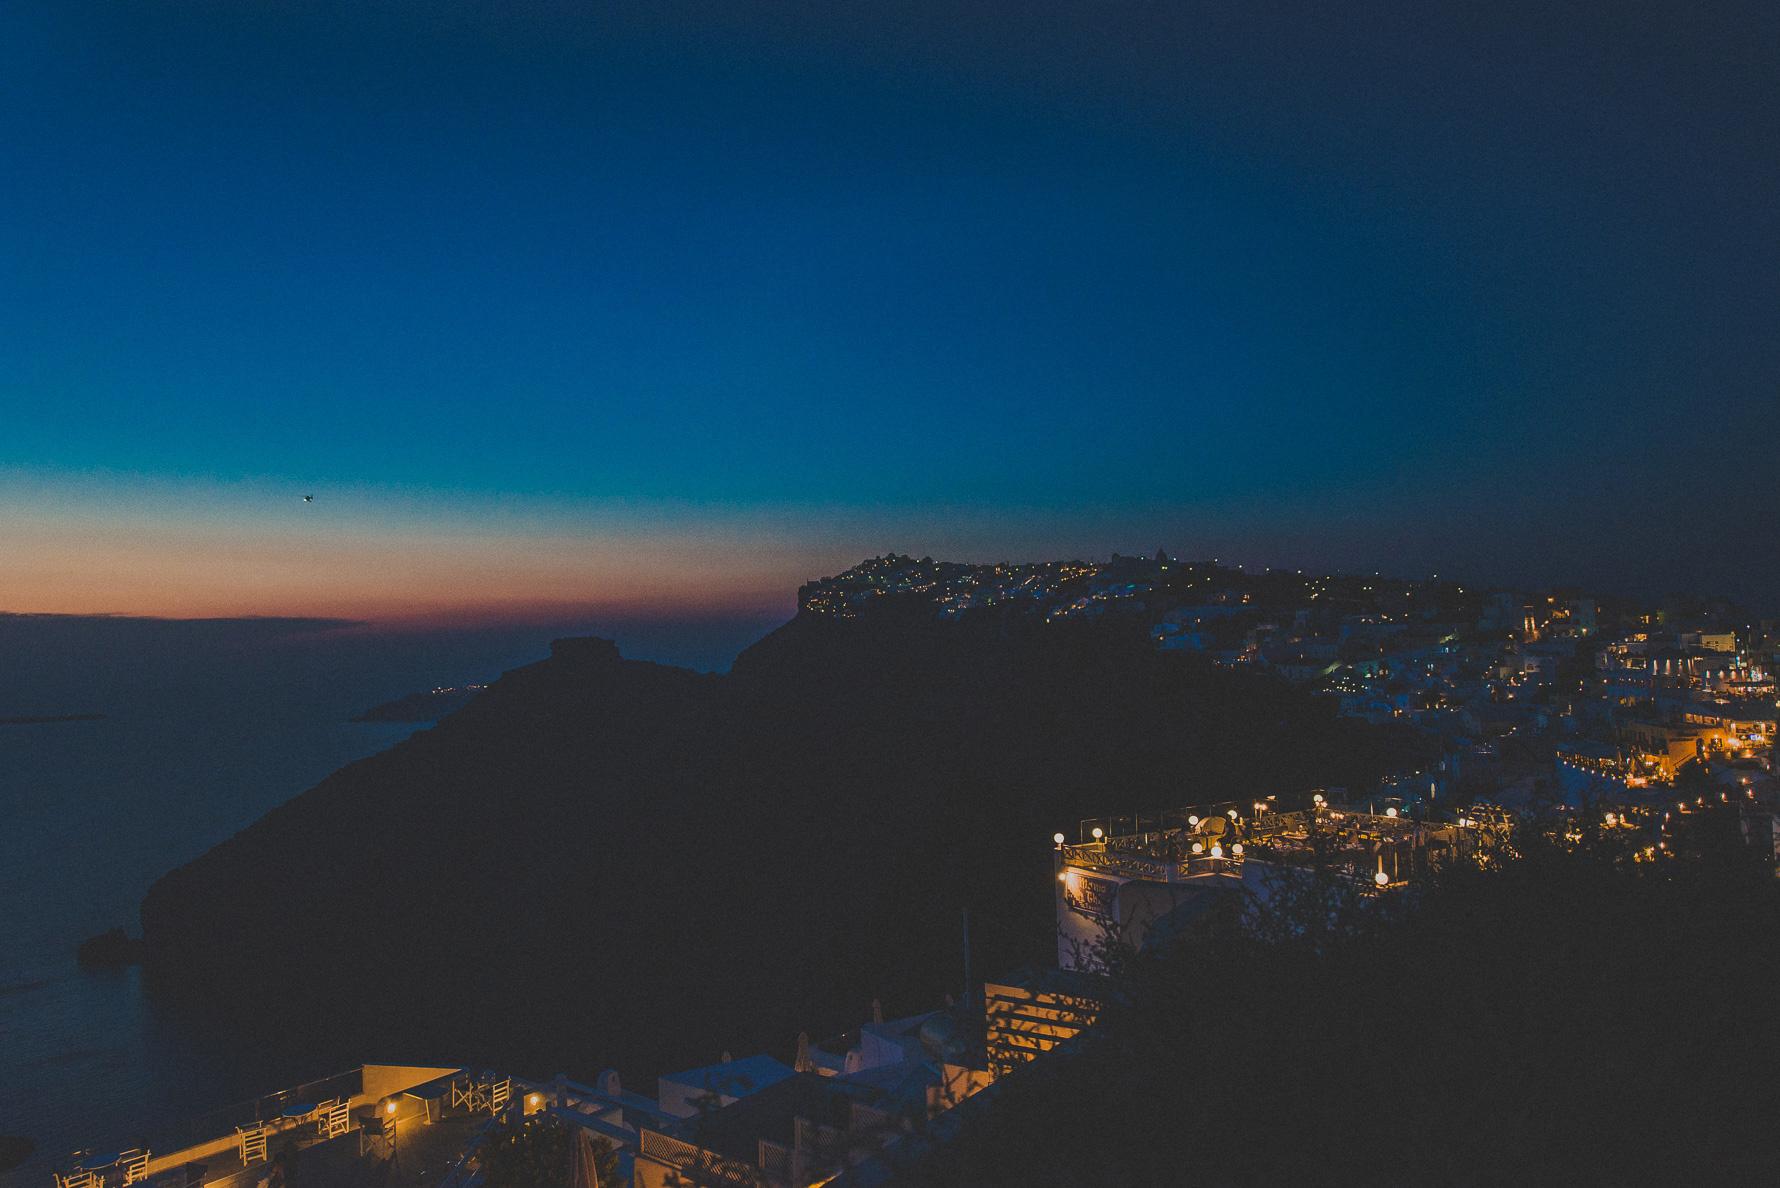 santorini-destination-wedding-photographer-livio-lacurre-amazing-view-sunset-portrait